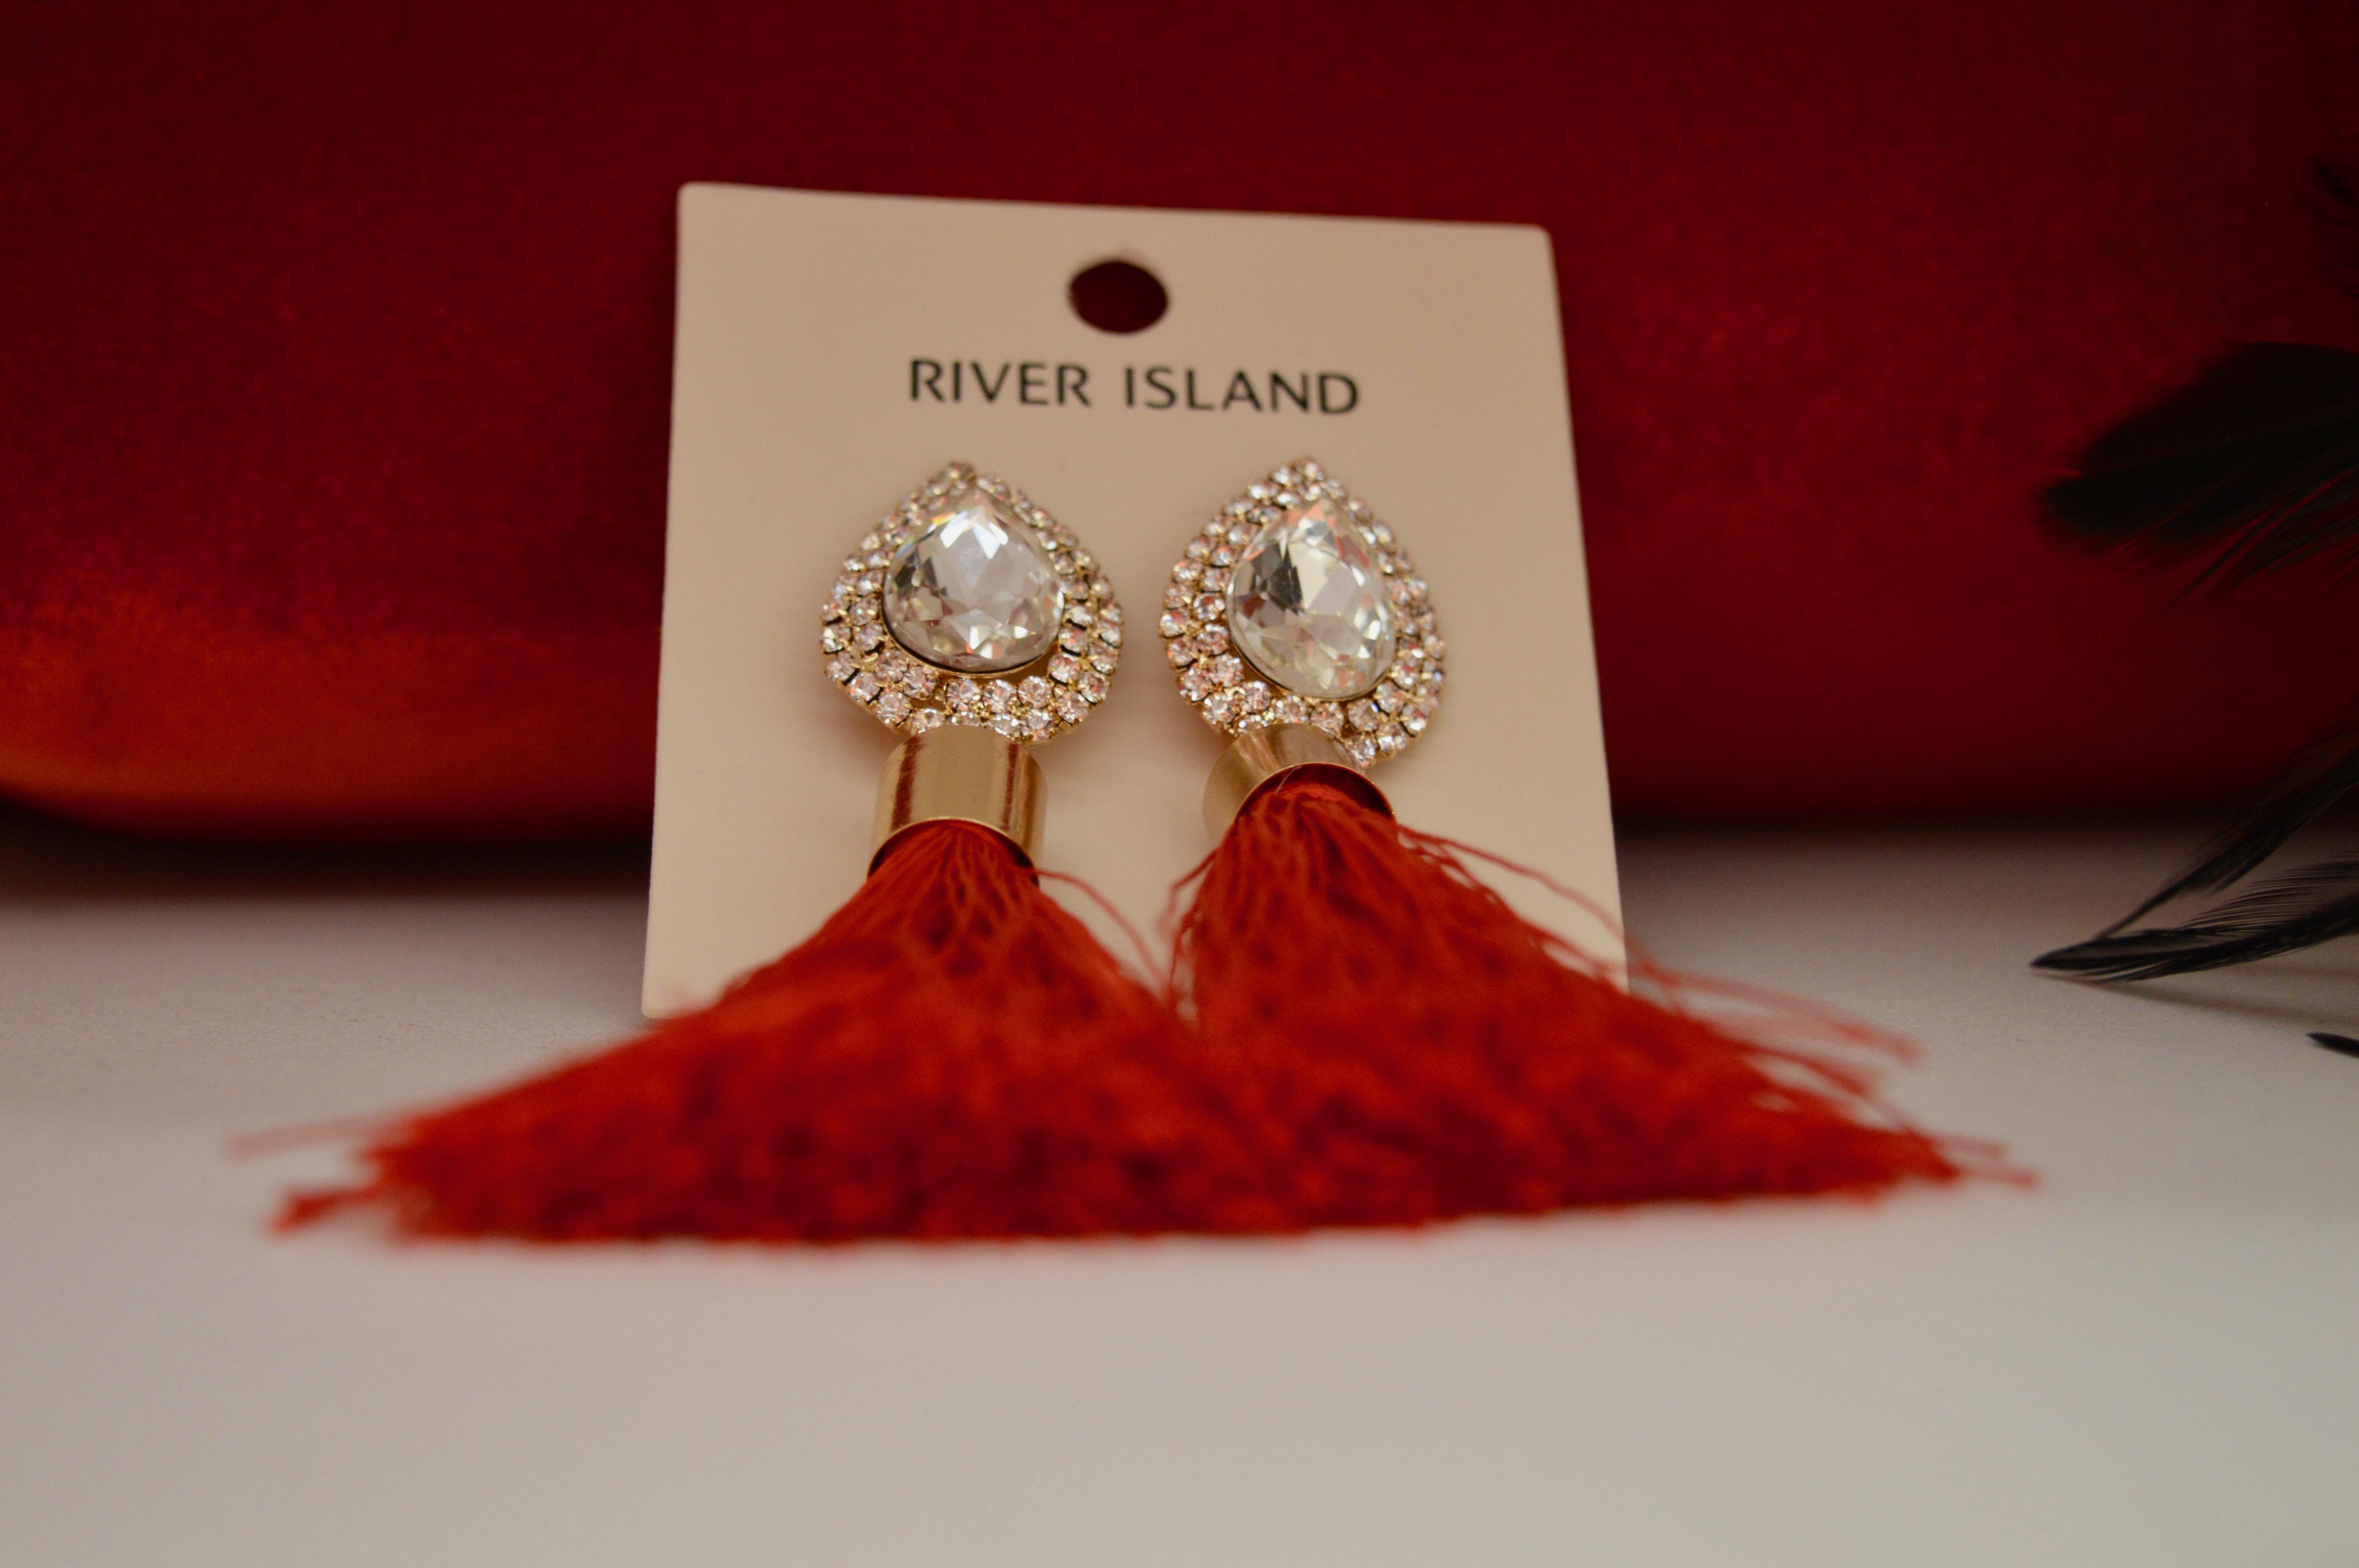 river-island-tassle-earrings-intu-eldon-square-winter-fashion-stylissimo-newcastle-high-street-halloween-elle-blonde-luxury-lifestyle-destination-blog